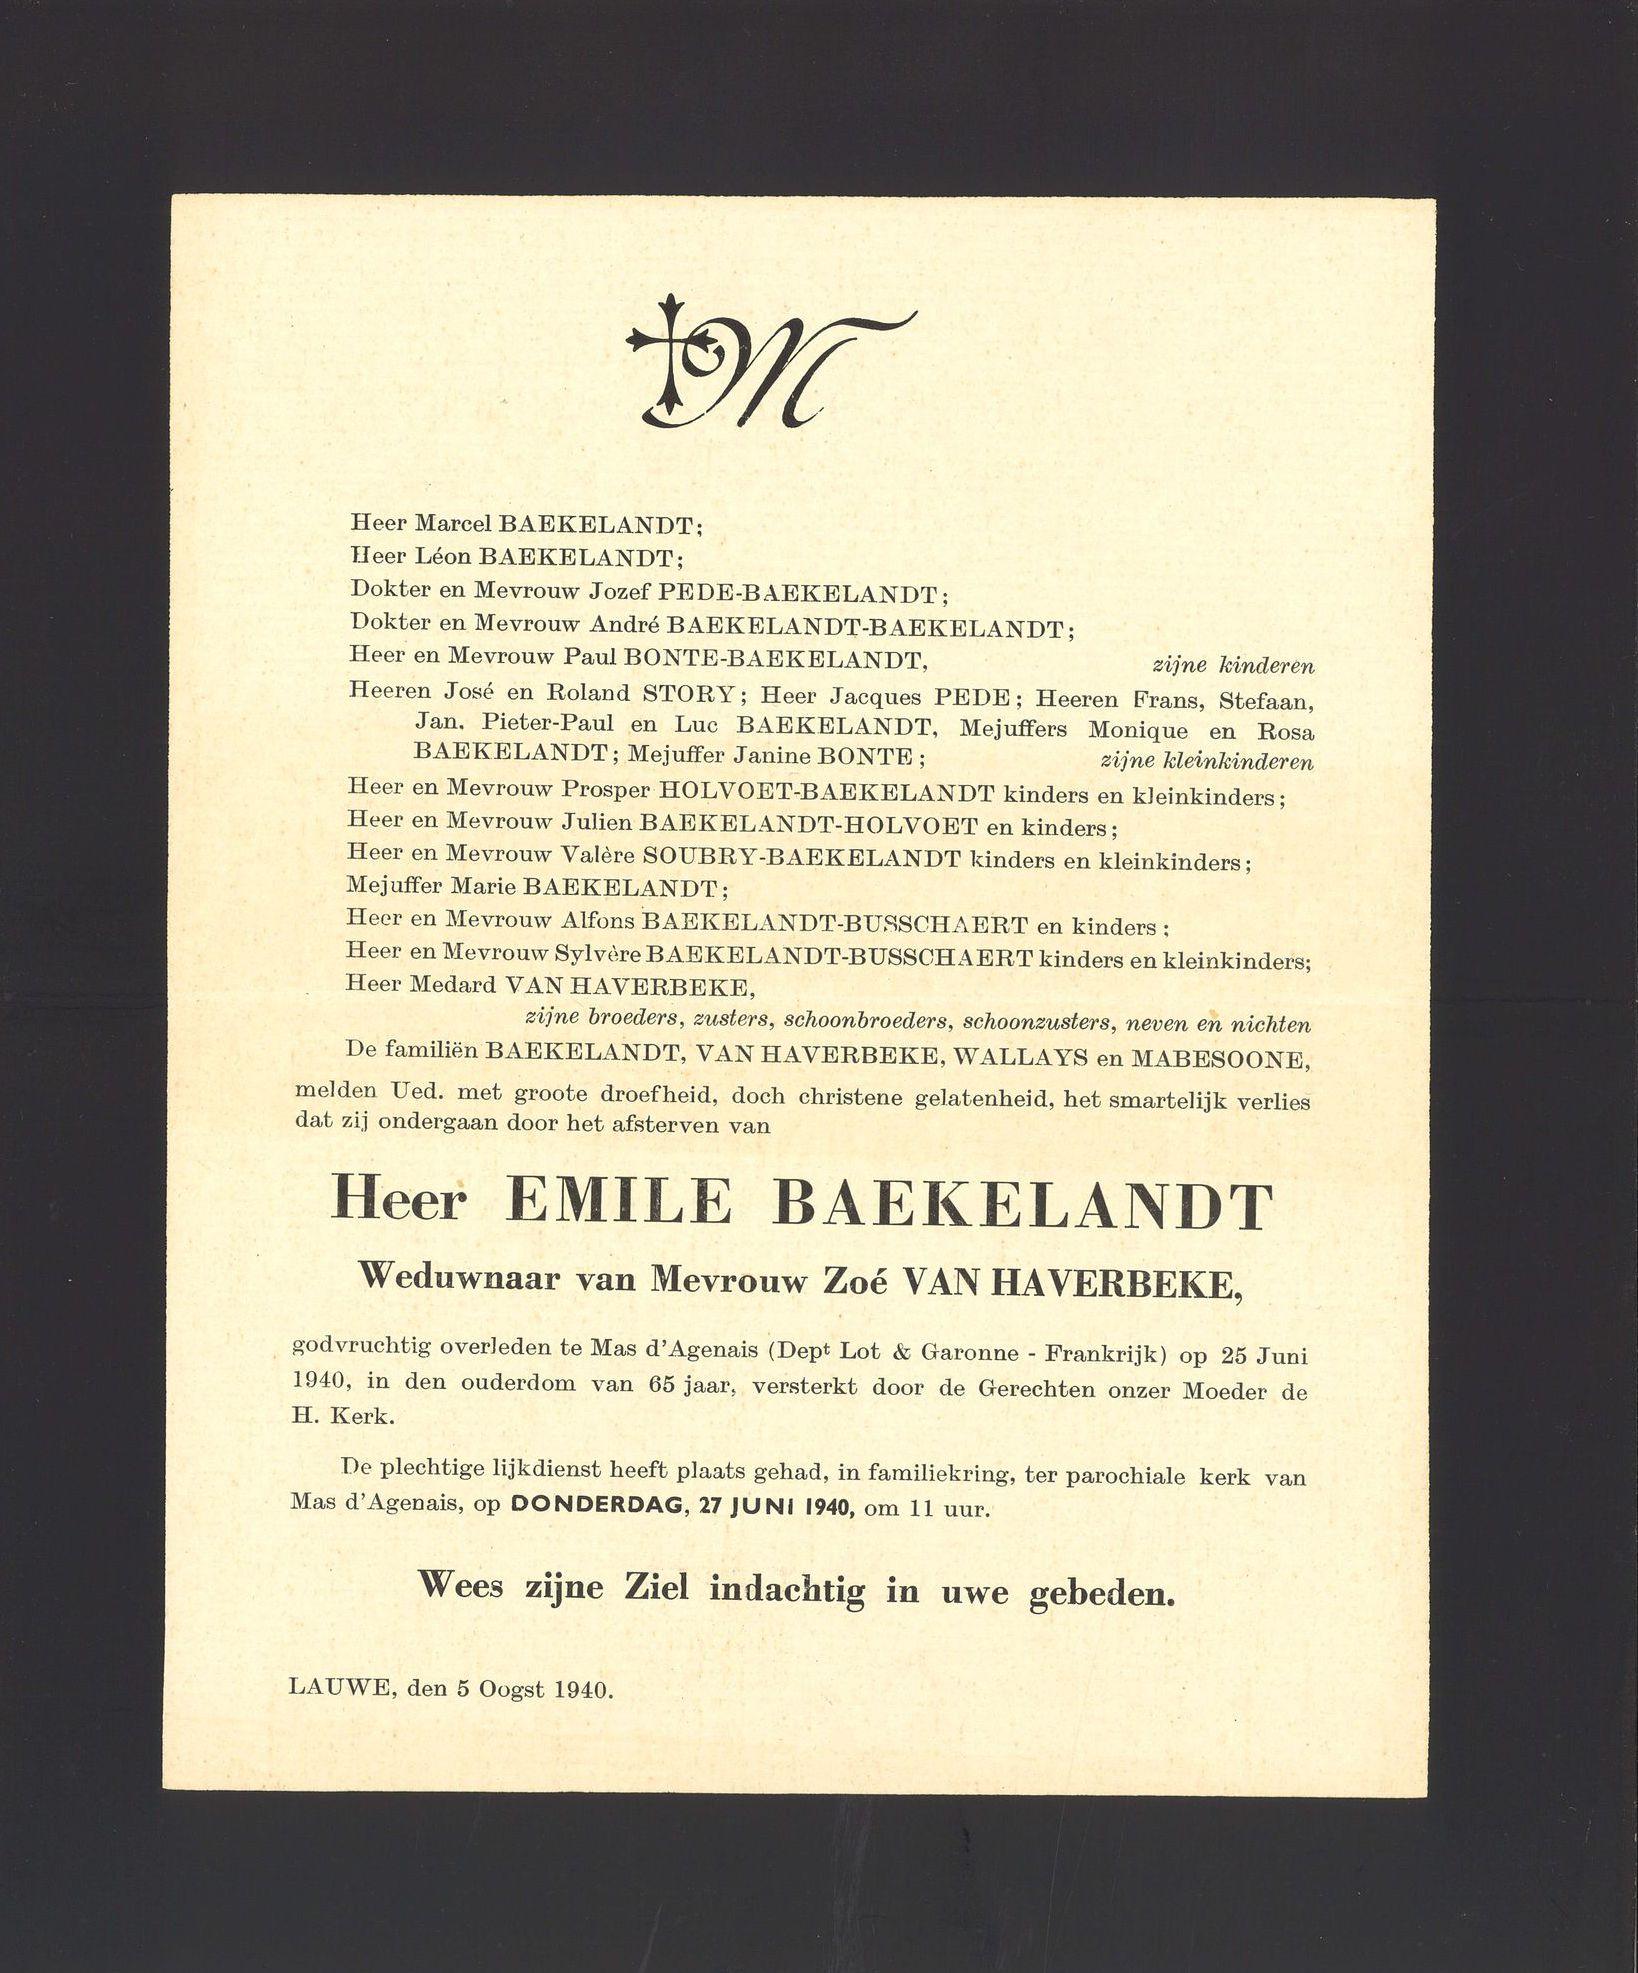 Emile Baekelandt